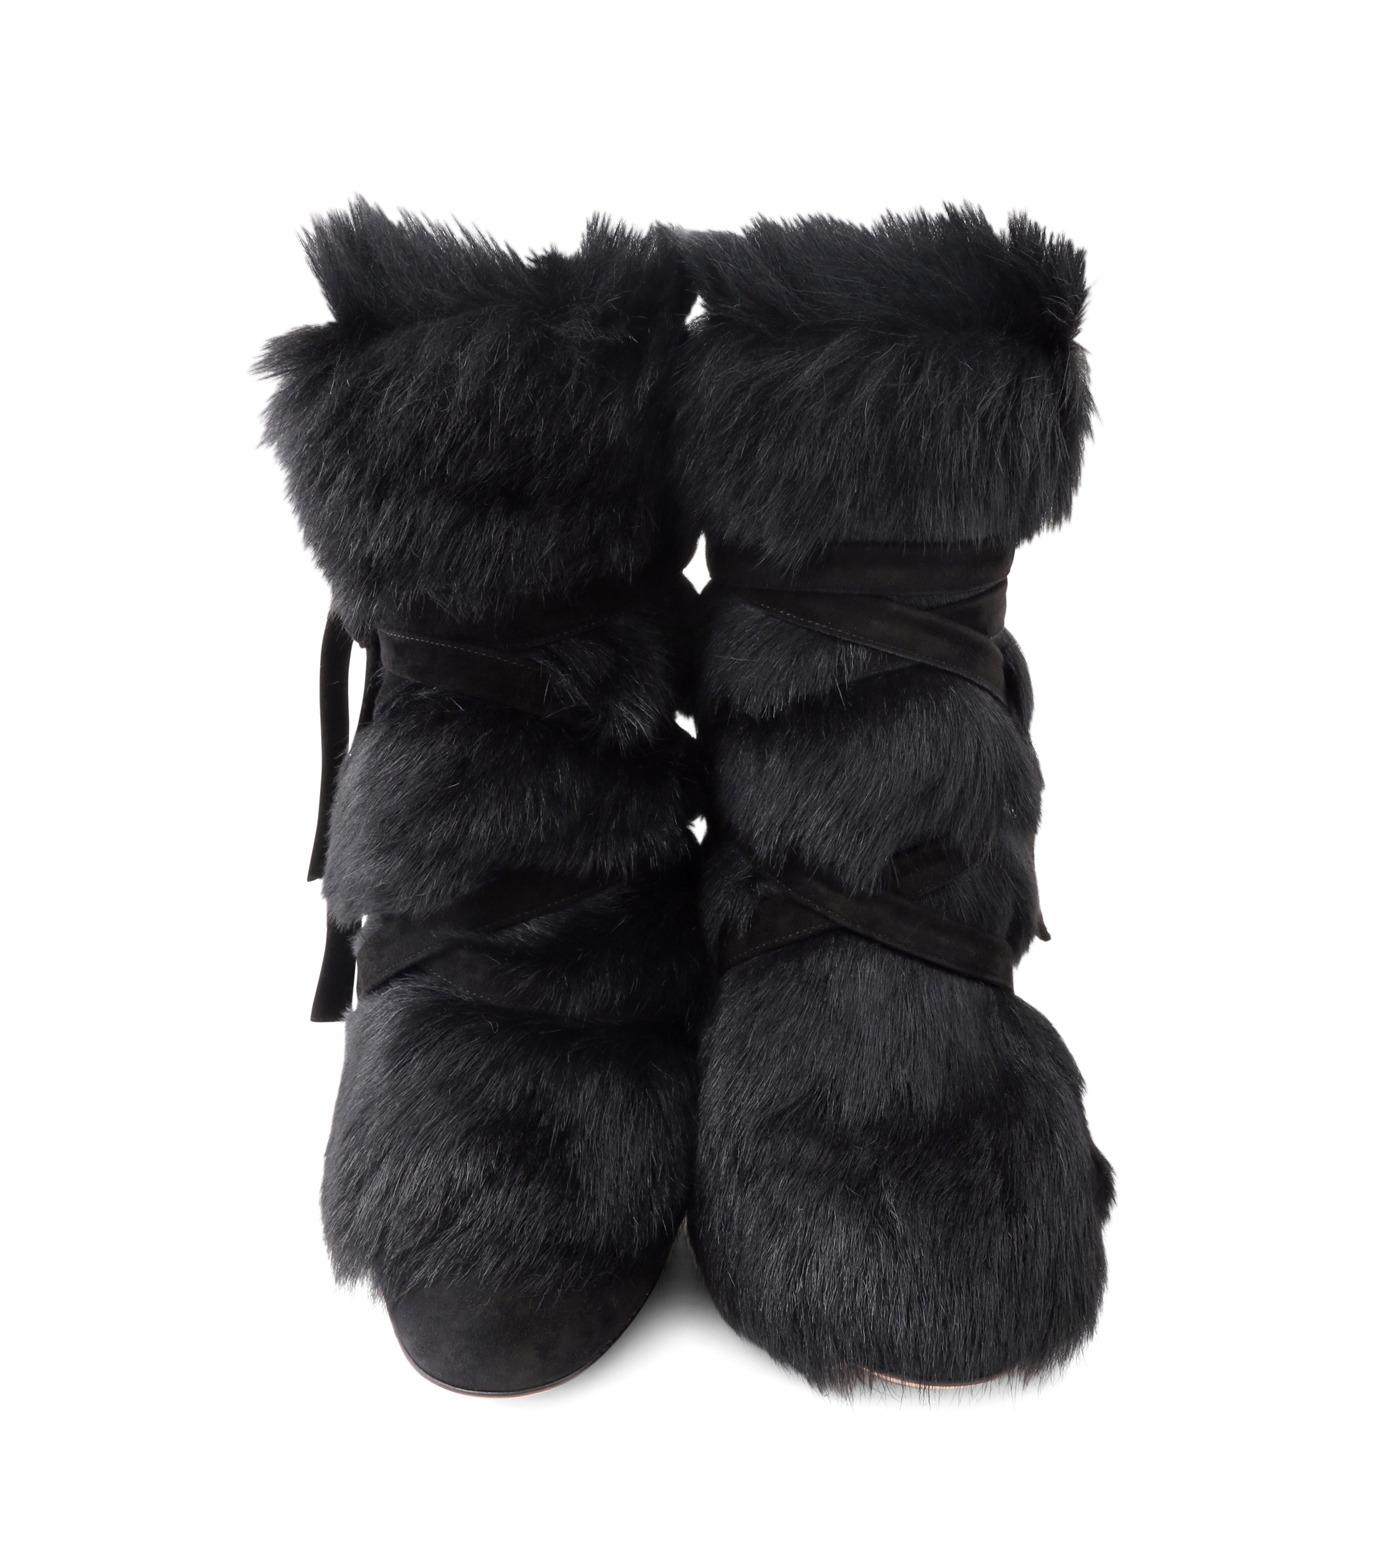 Gianvito Rossi(ジャンヴィト ロッシ)のShort Boots w/Goat Fur-BLACK(ブーツ/boots)-70469-13 拡大詳細画像4